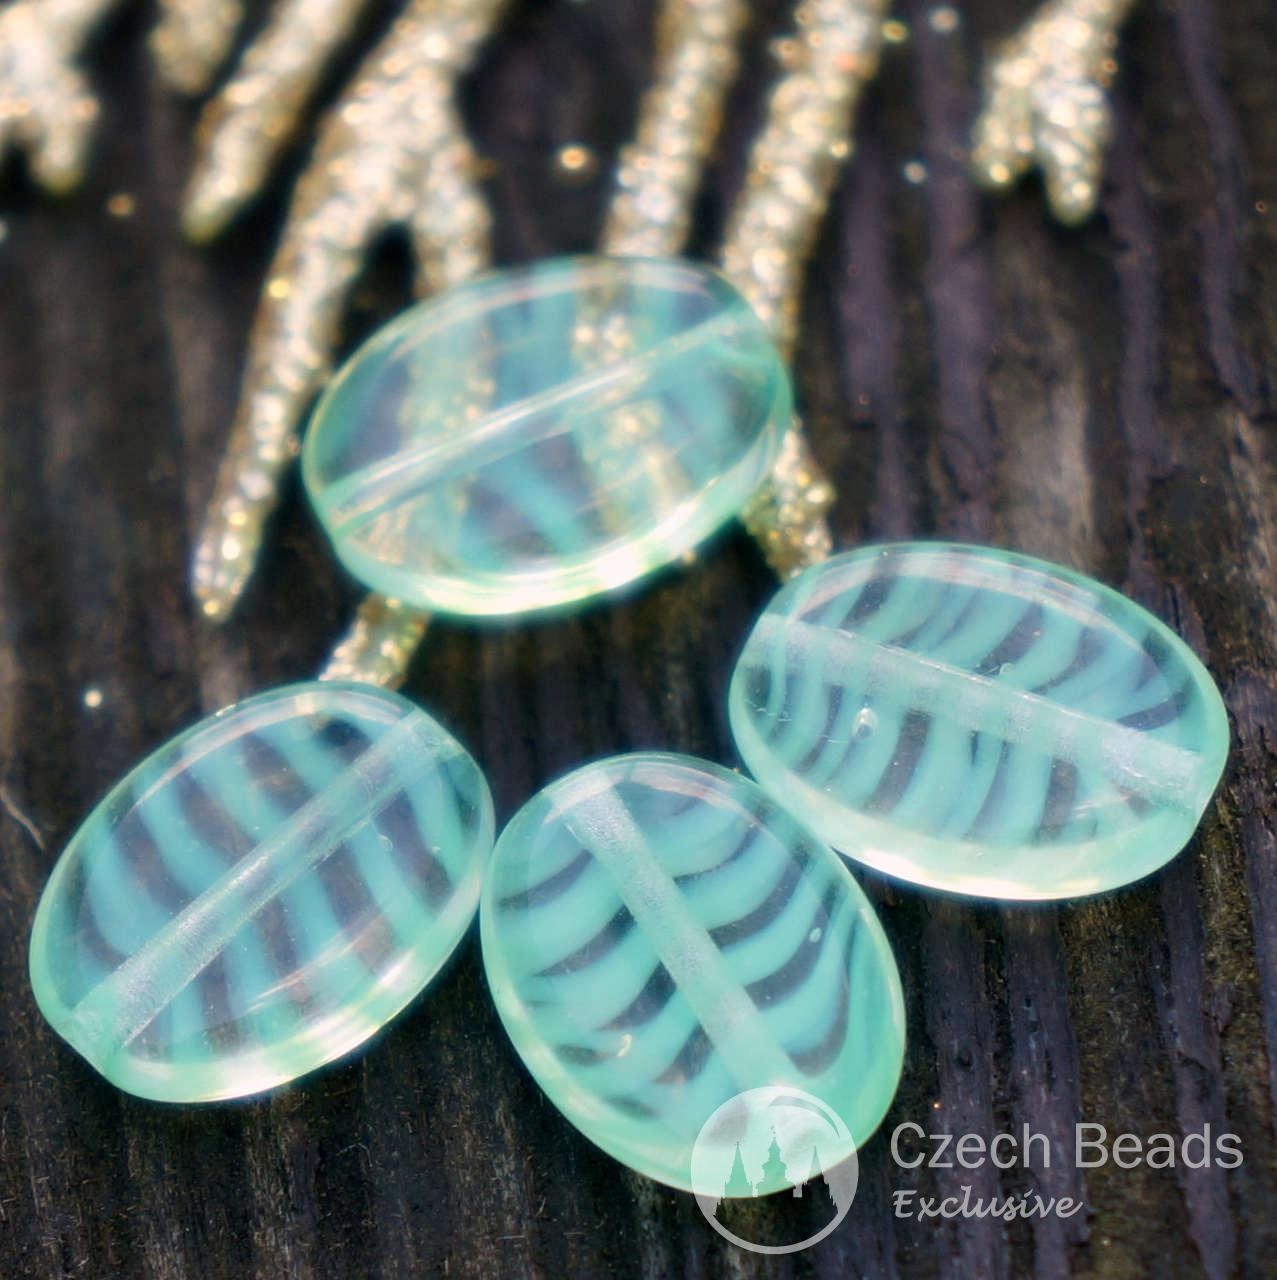 De color Verde claro Oval checa Perlas de Vidrio Rayas Plana y Ovalada Perlas de color Verde Claro Verde de Perlas Oval Plana de Perlas de Vidrio de 12 mm x 9 mm 6pc para $ 2.4 de Czech Beads Exclusive